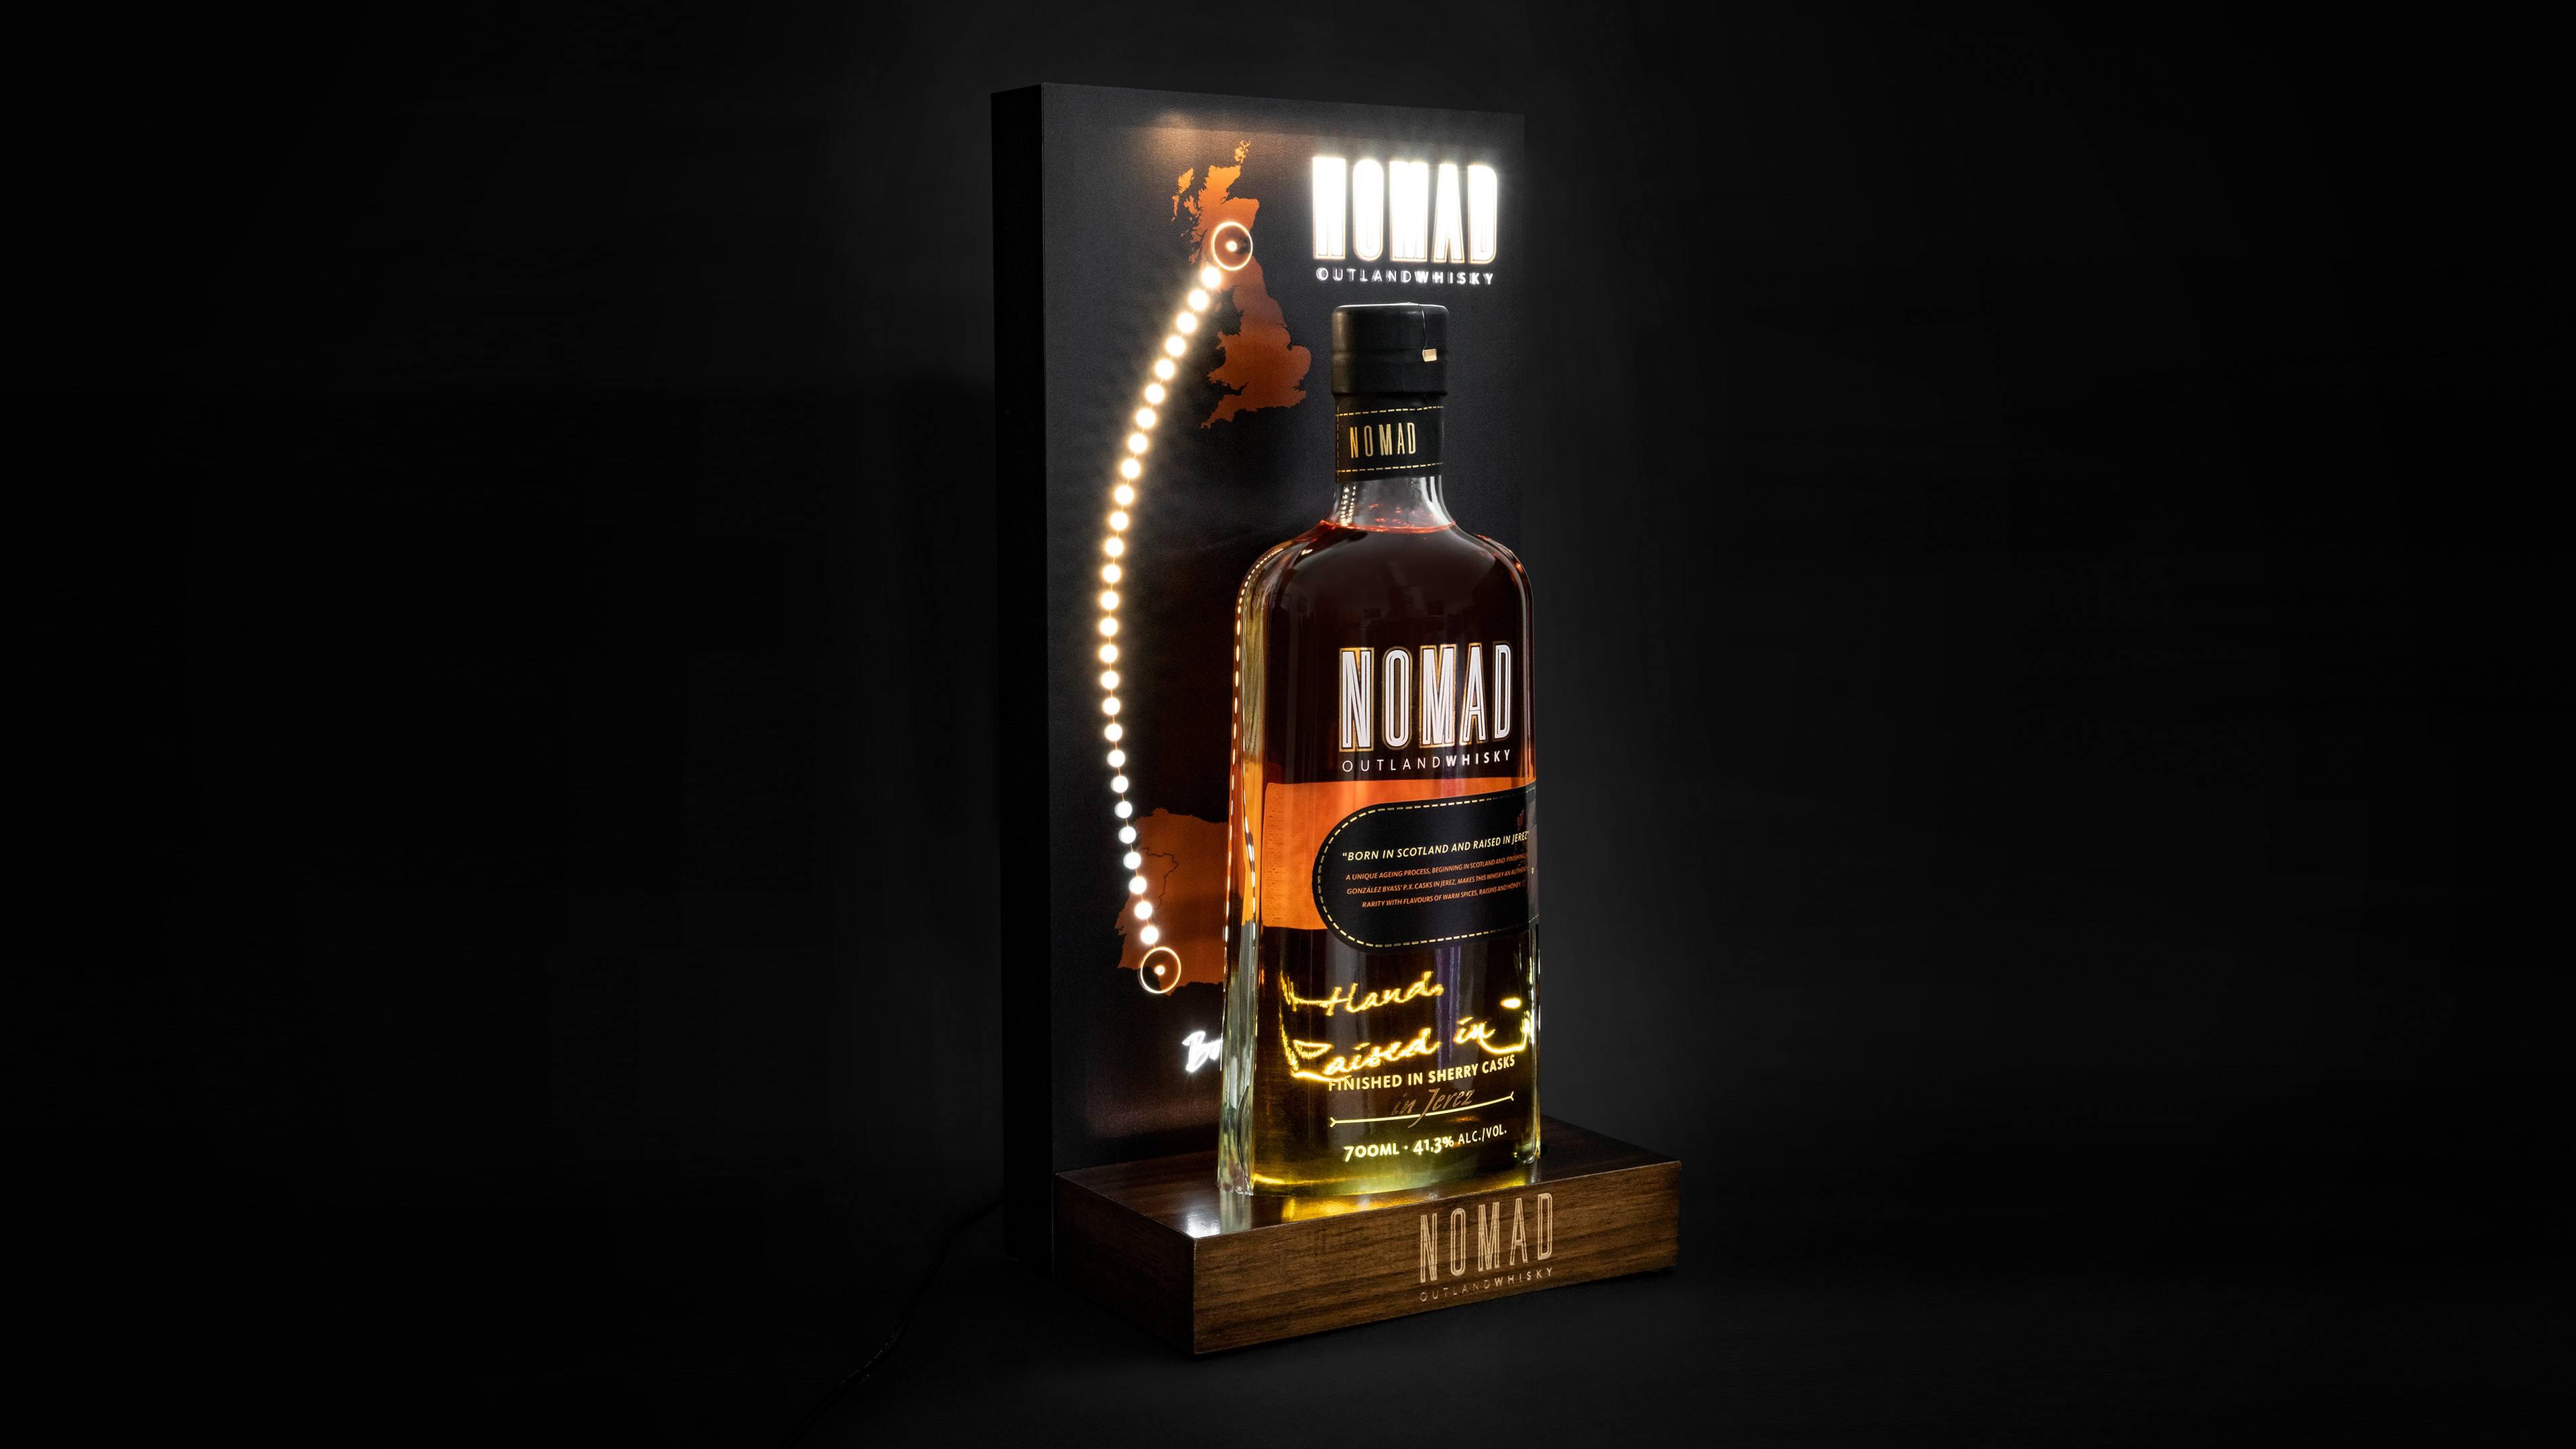 Nomad Outland Whisky Glorifier LED Display blinking blinkt leuchtet Lampe beleuchtung Holz Flaschenbeleuchtung Bottle Lamp Whiskey